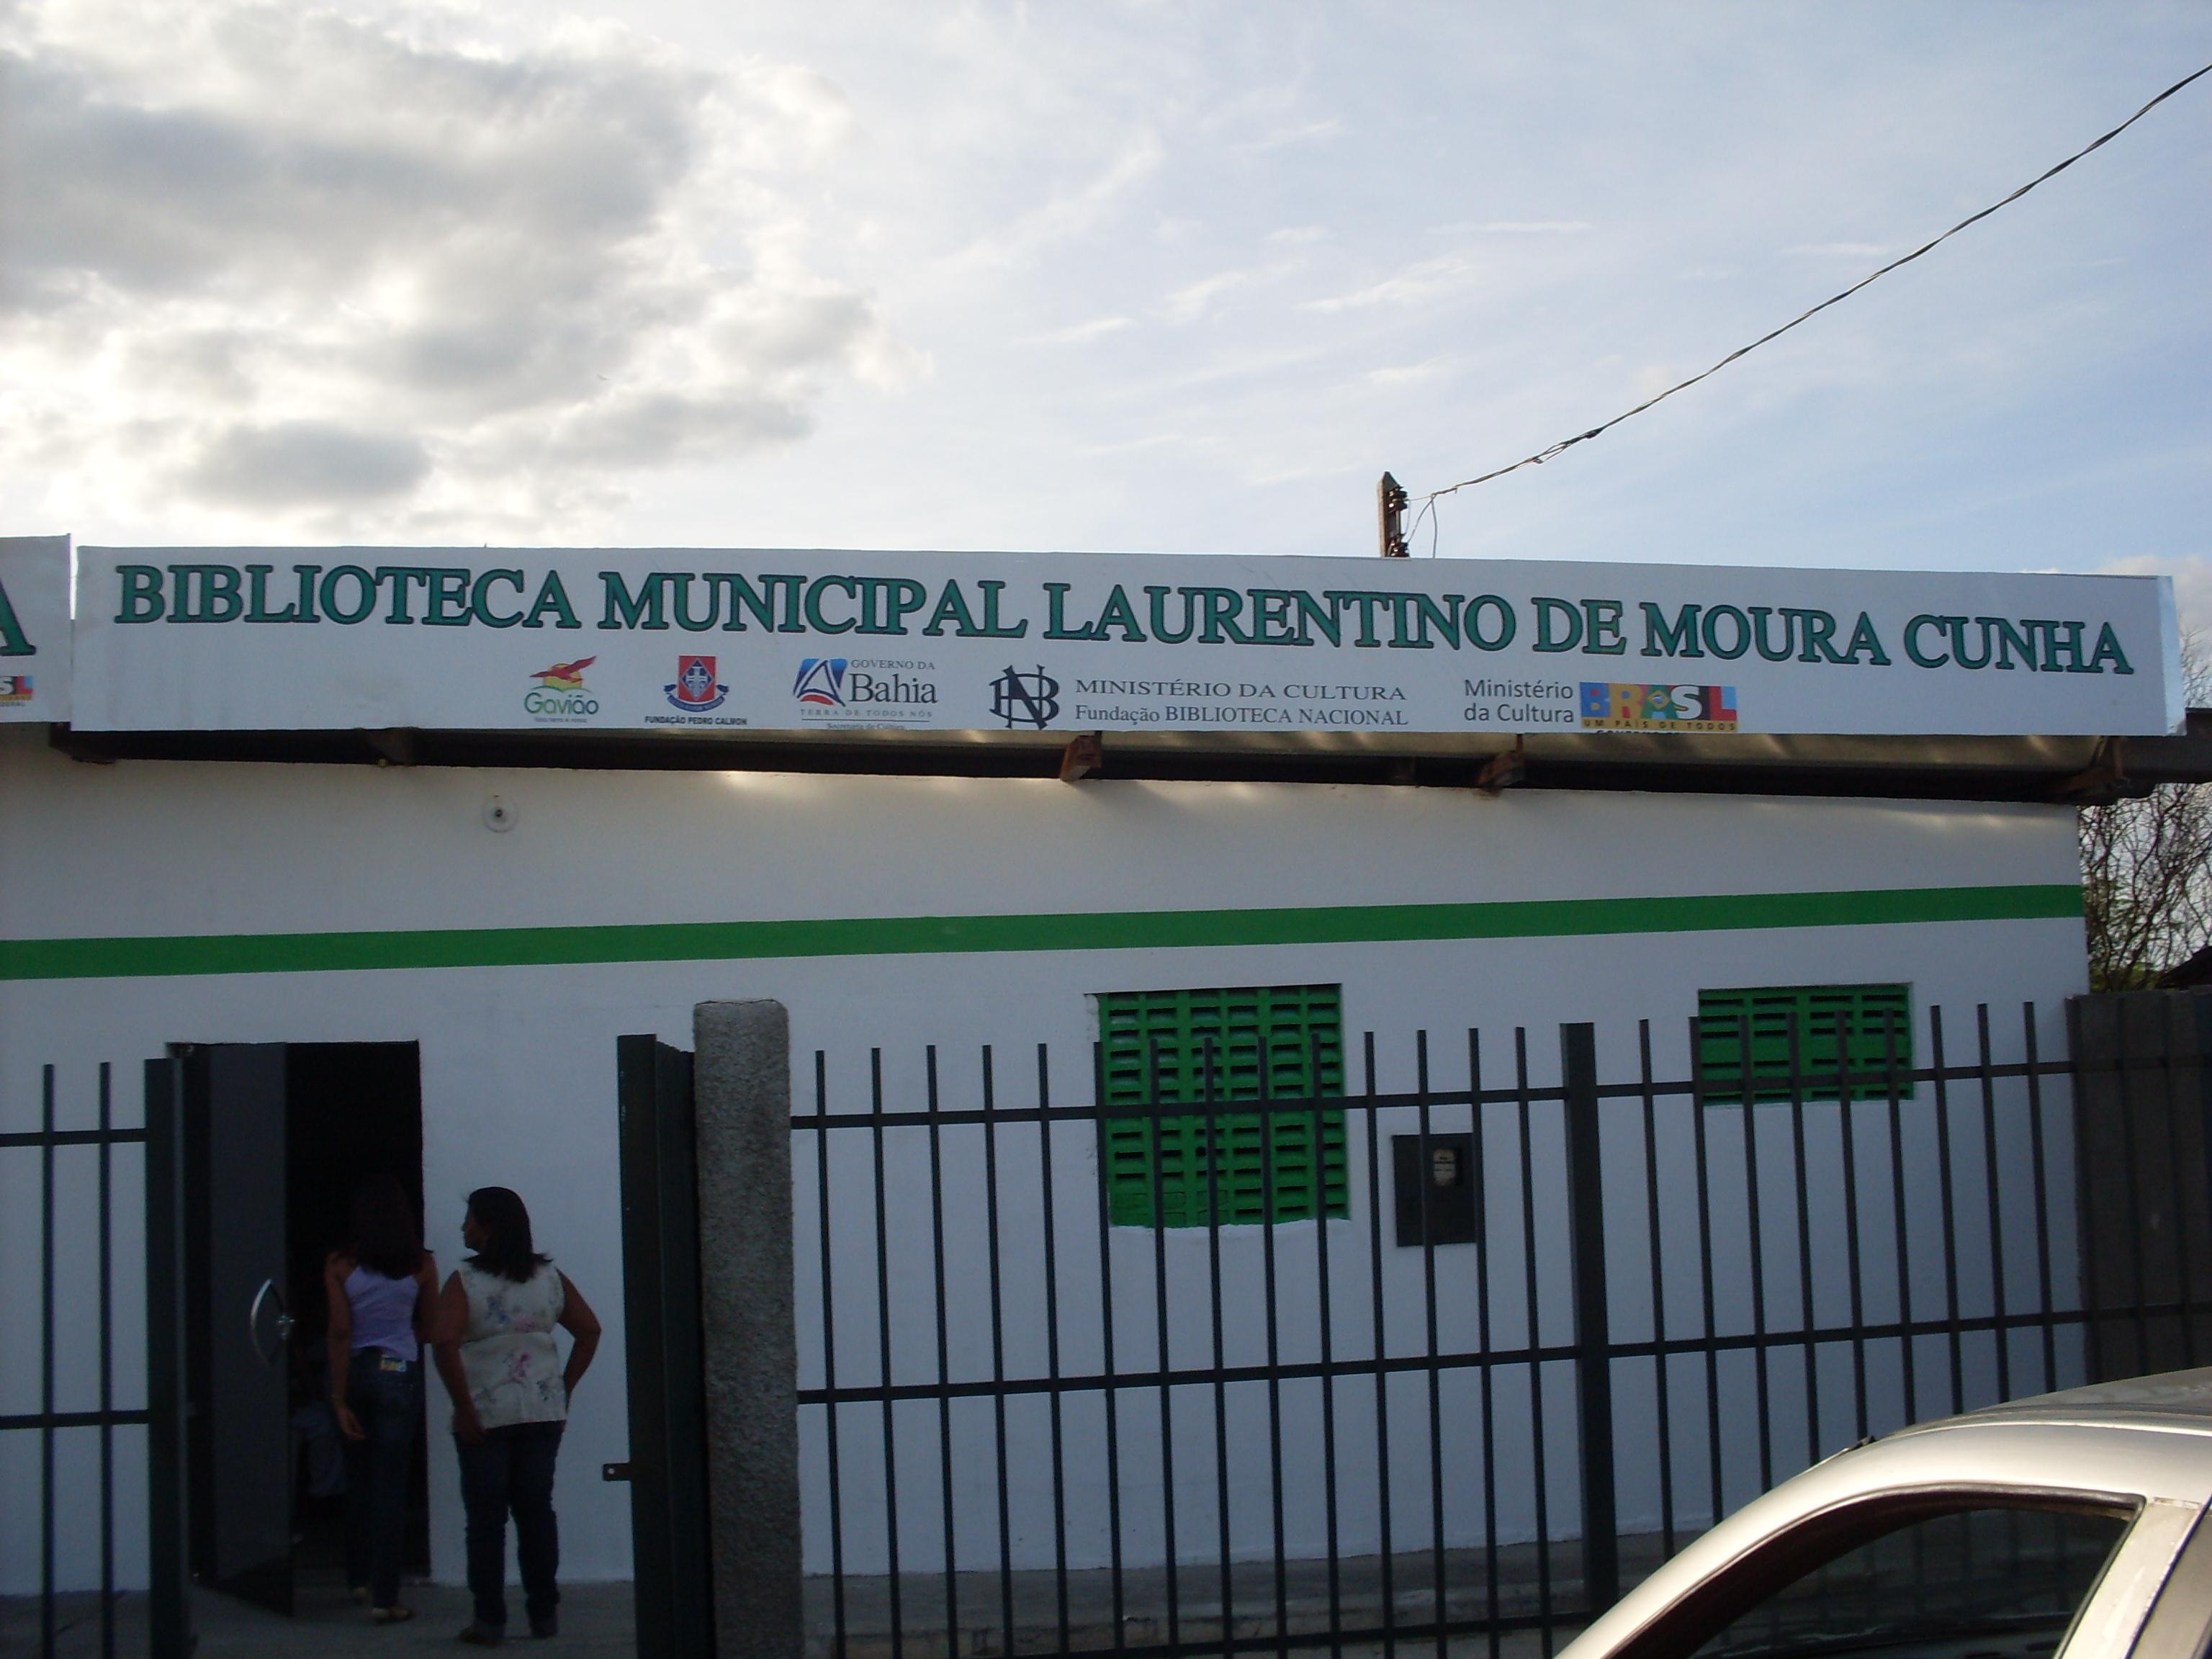 Gavião Bahia fonte: upload.wikimedia.org